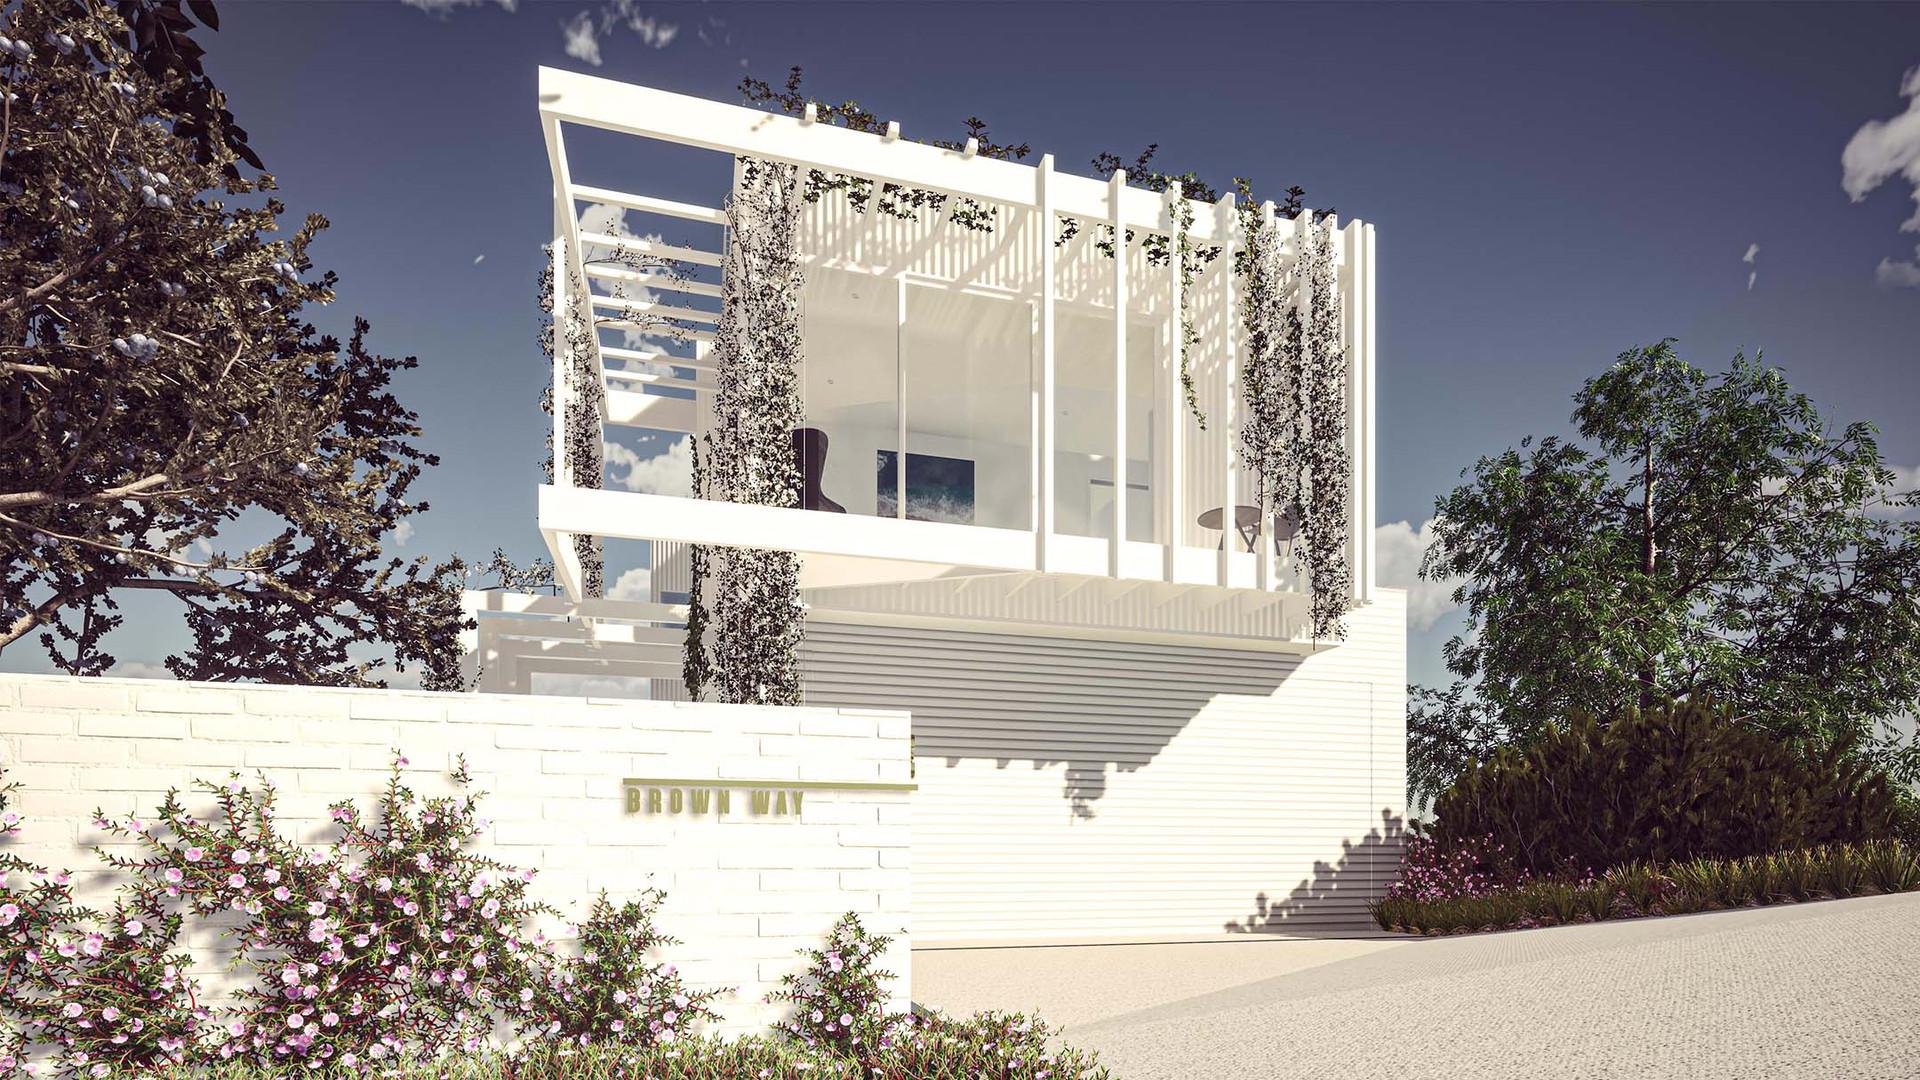 K9 HOUSE 1.jpg